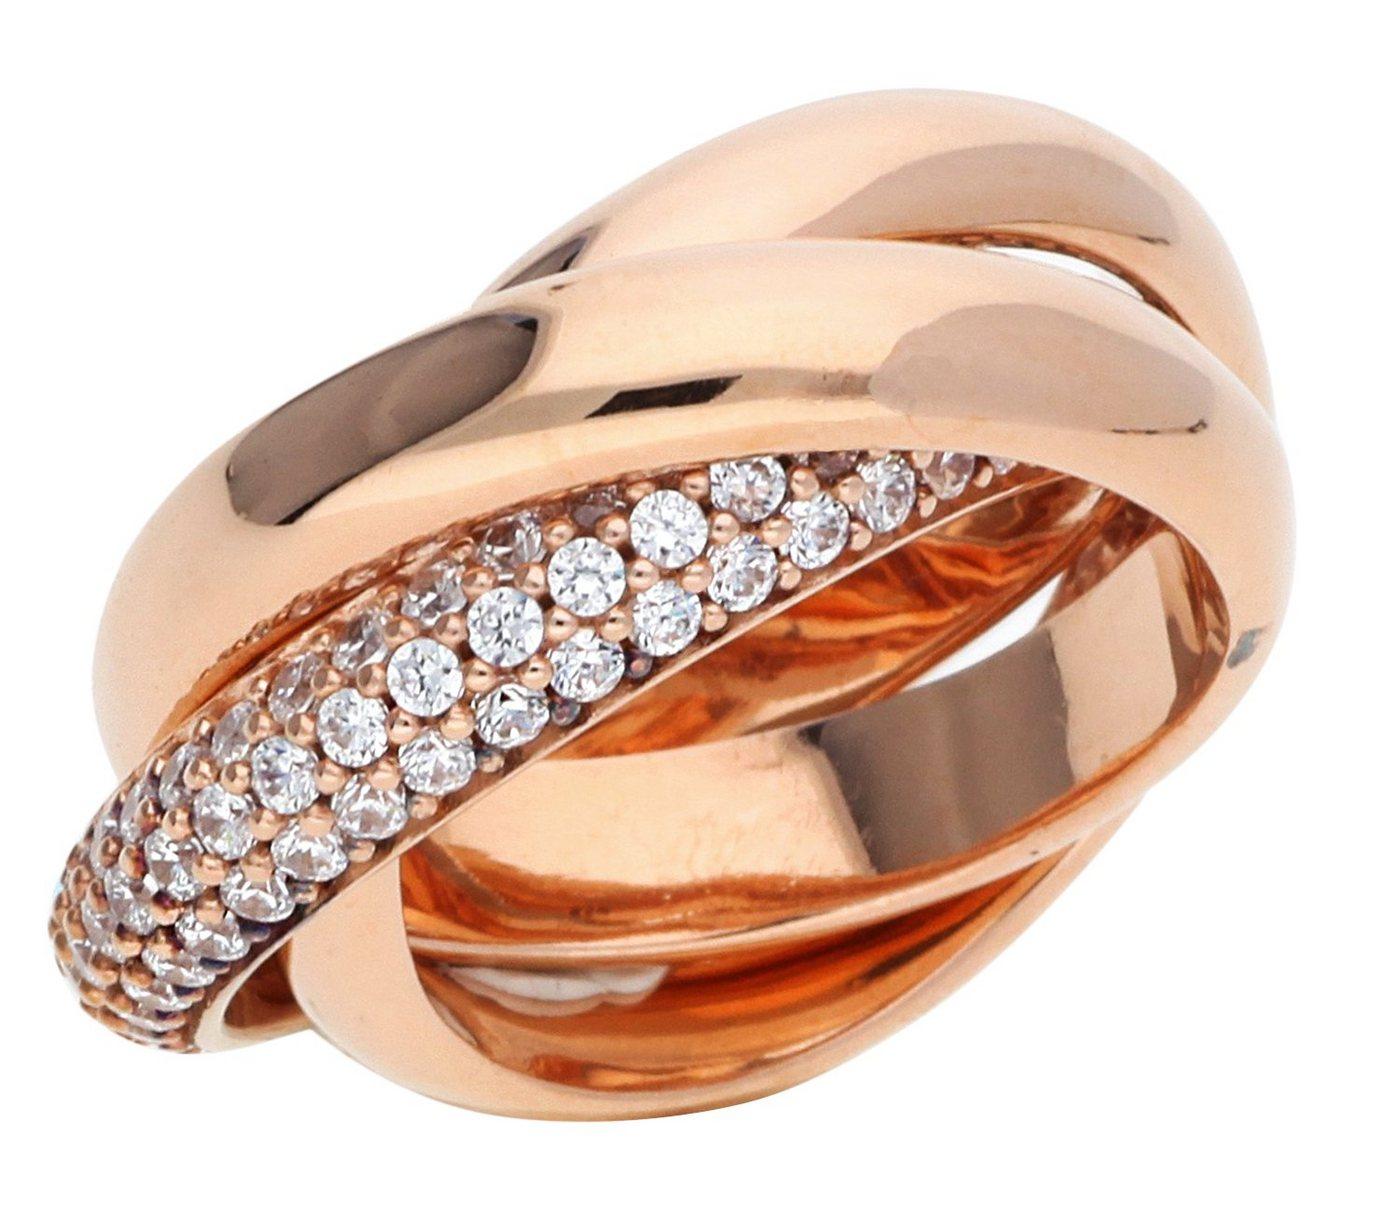 Esprit Fingerring | Schmuck > Ringe > Fingerringe | Goldfarben | Esprit